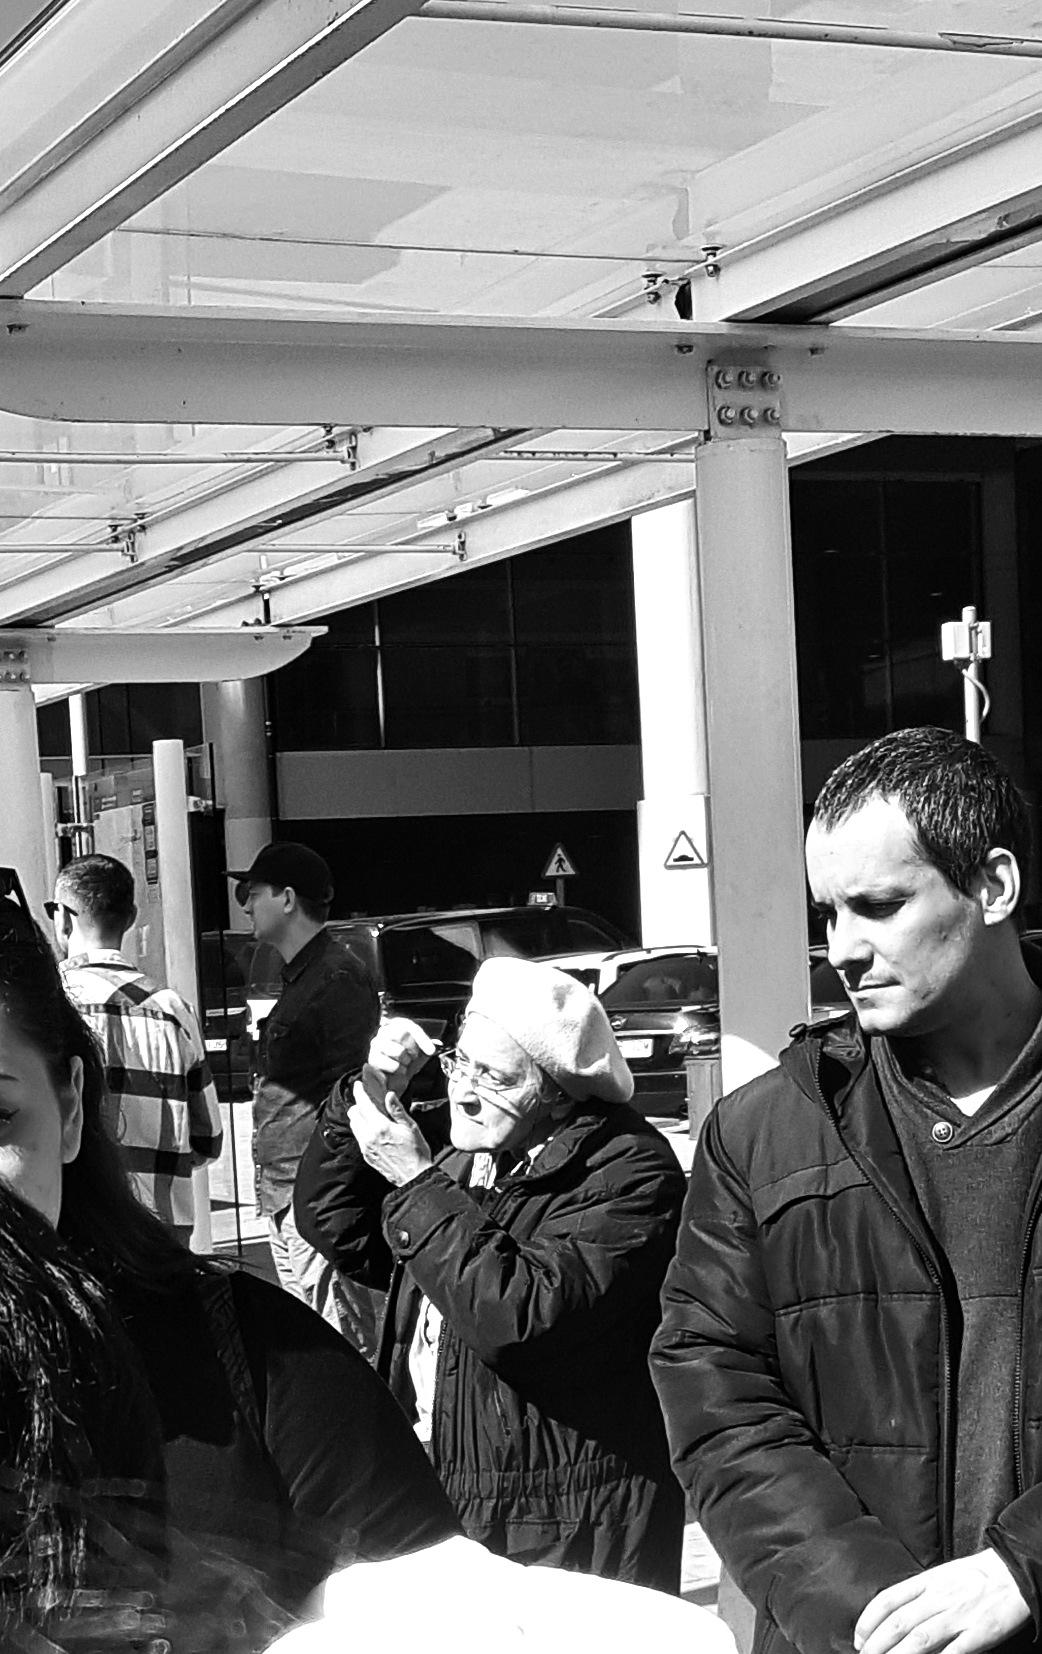 Waxing at bus stop by PortenyoBarcino